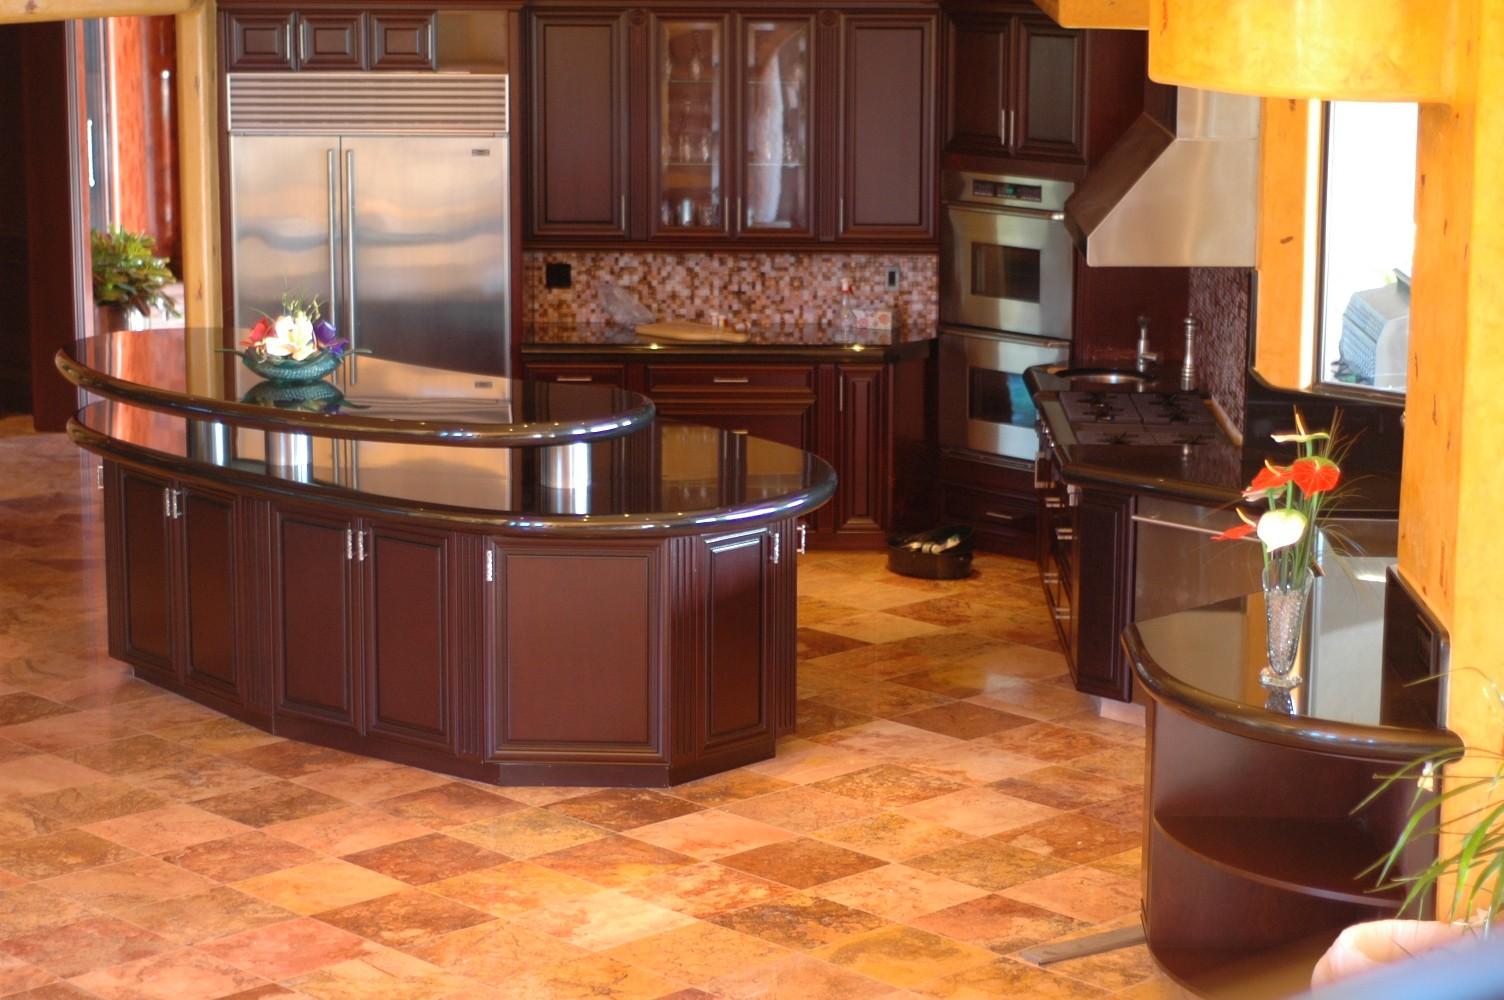 granite kitchen designs photo - 6